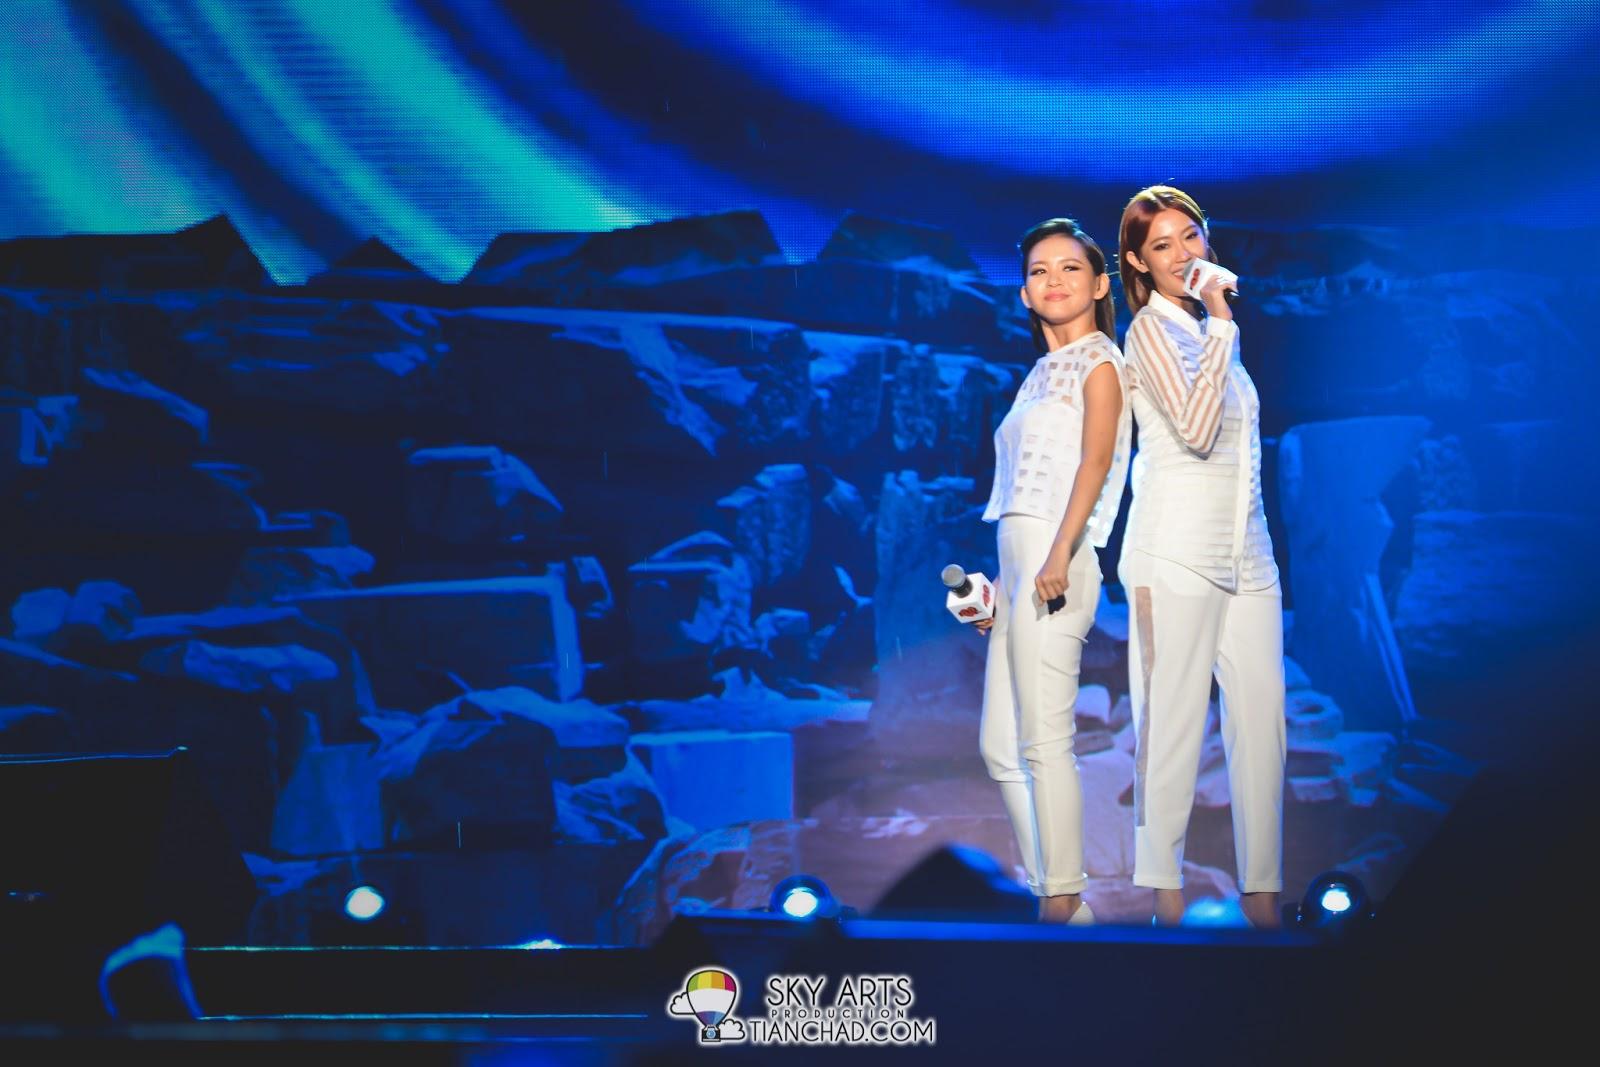 Elaine李宜玲 & Yuii陈静宜- 不醉不会